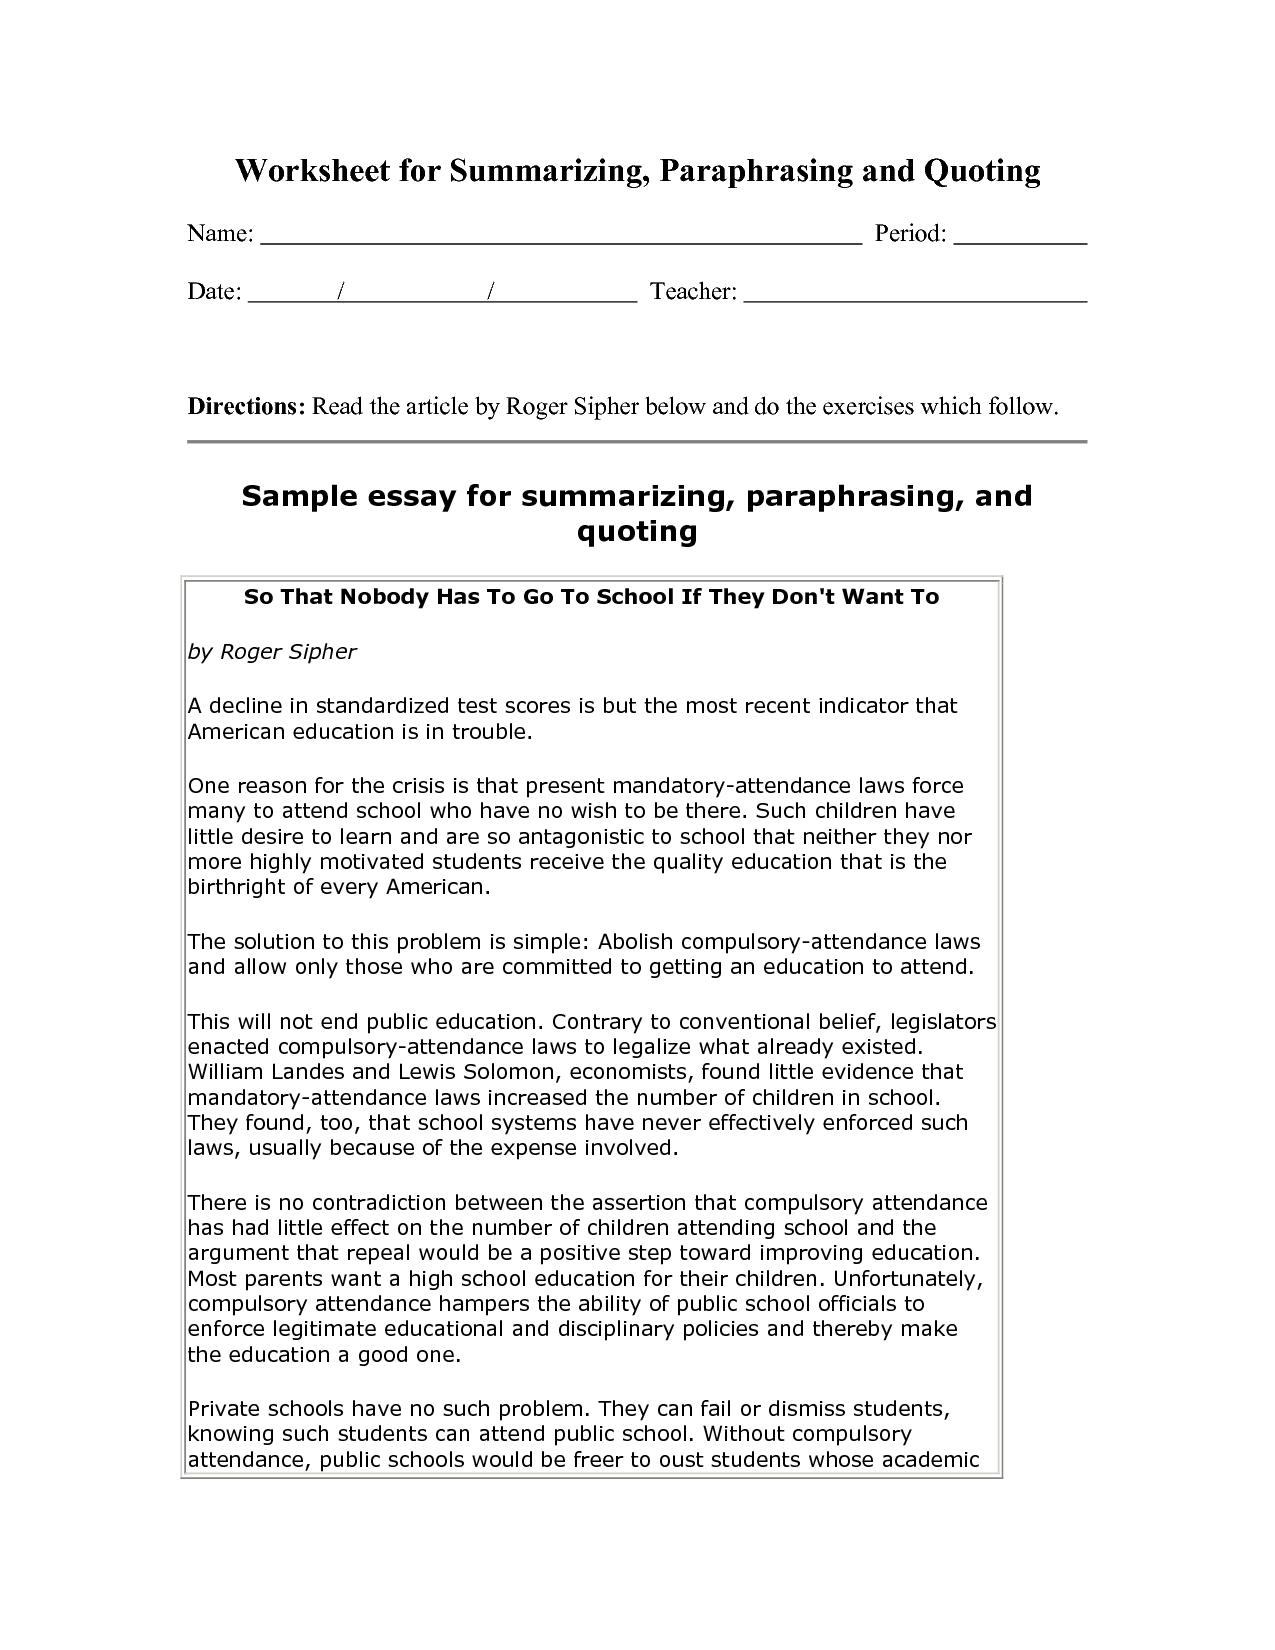 001 Example Of Summarizing Worksheets How To Summarize An